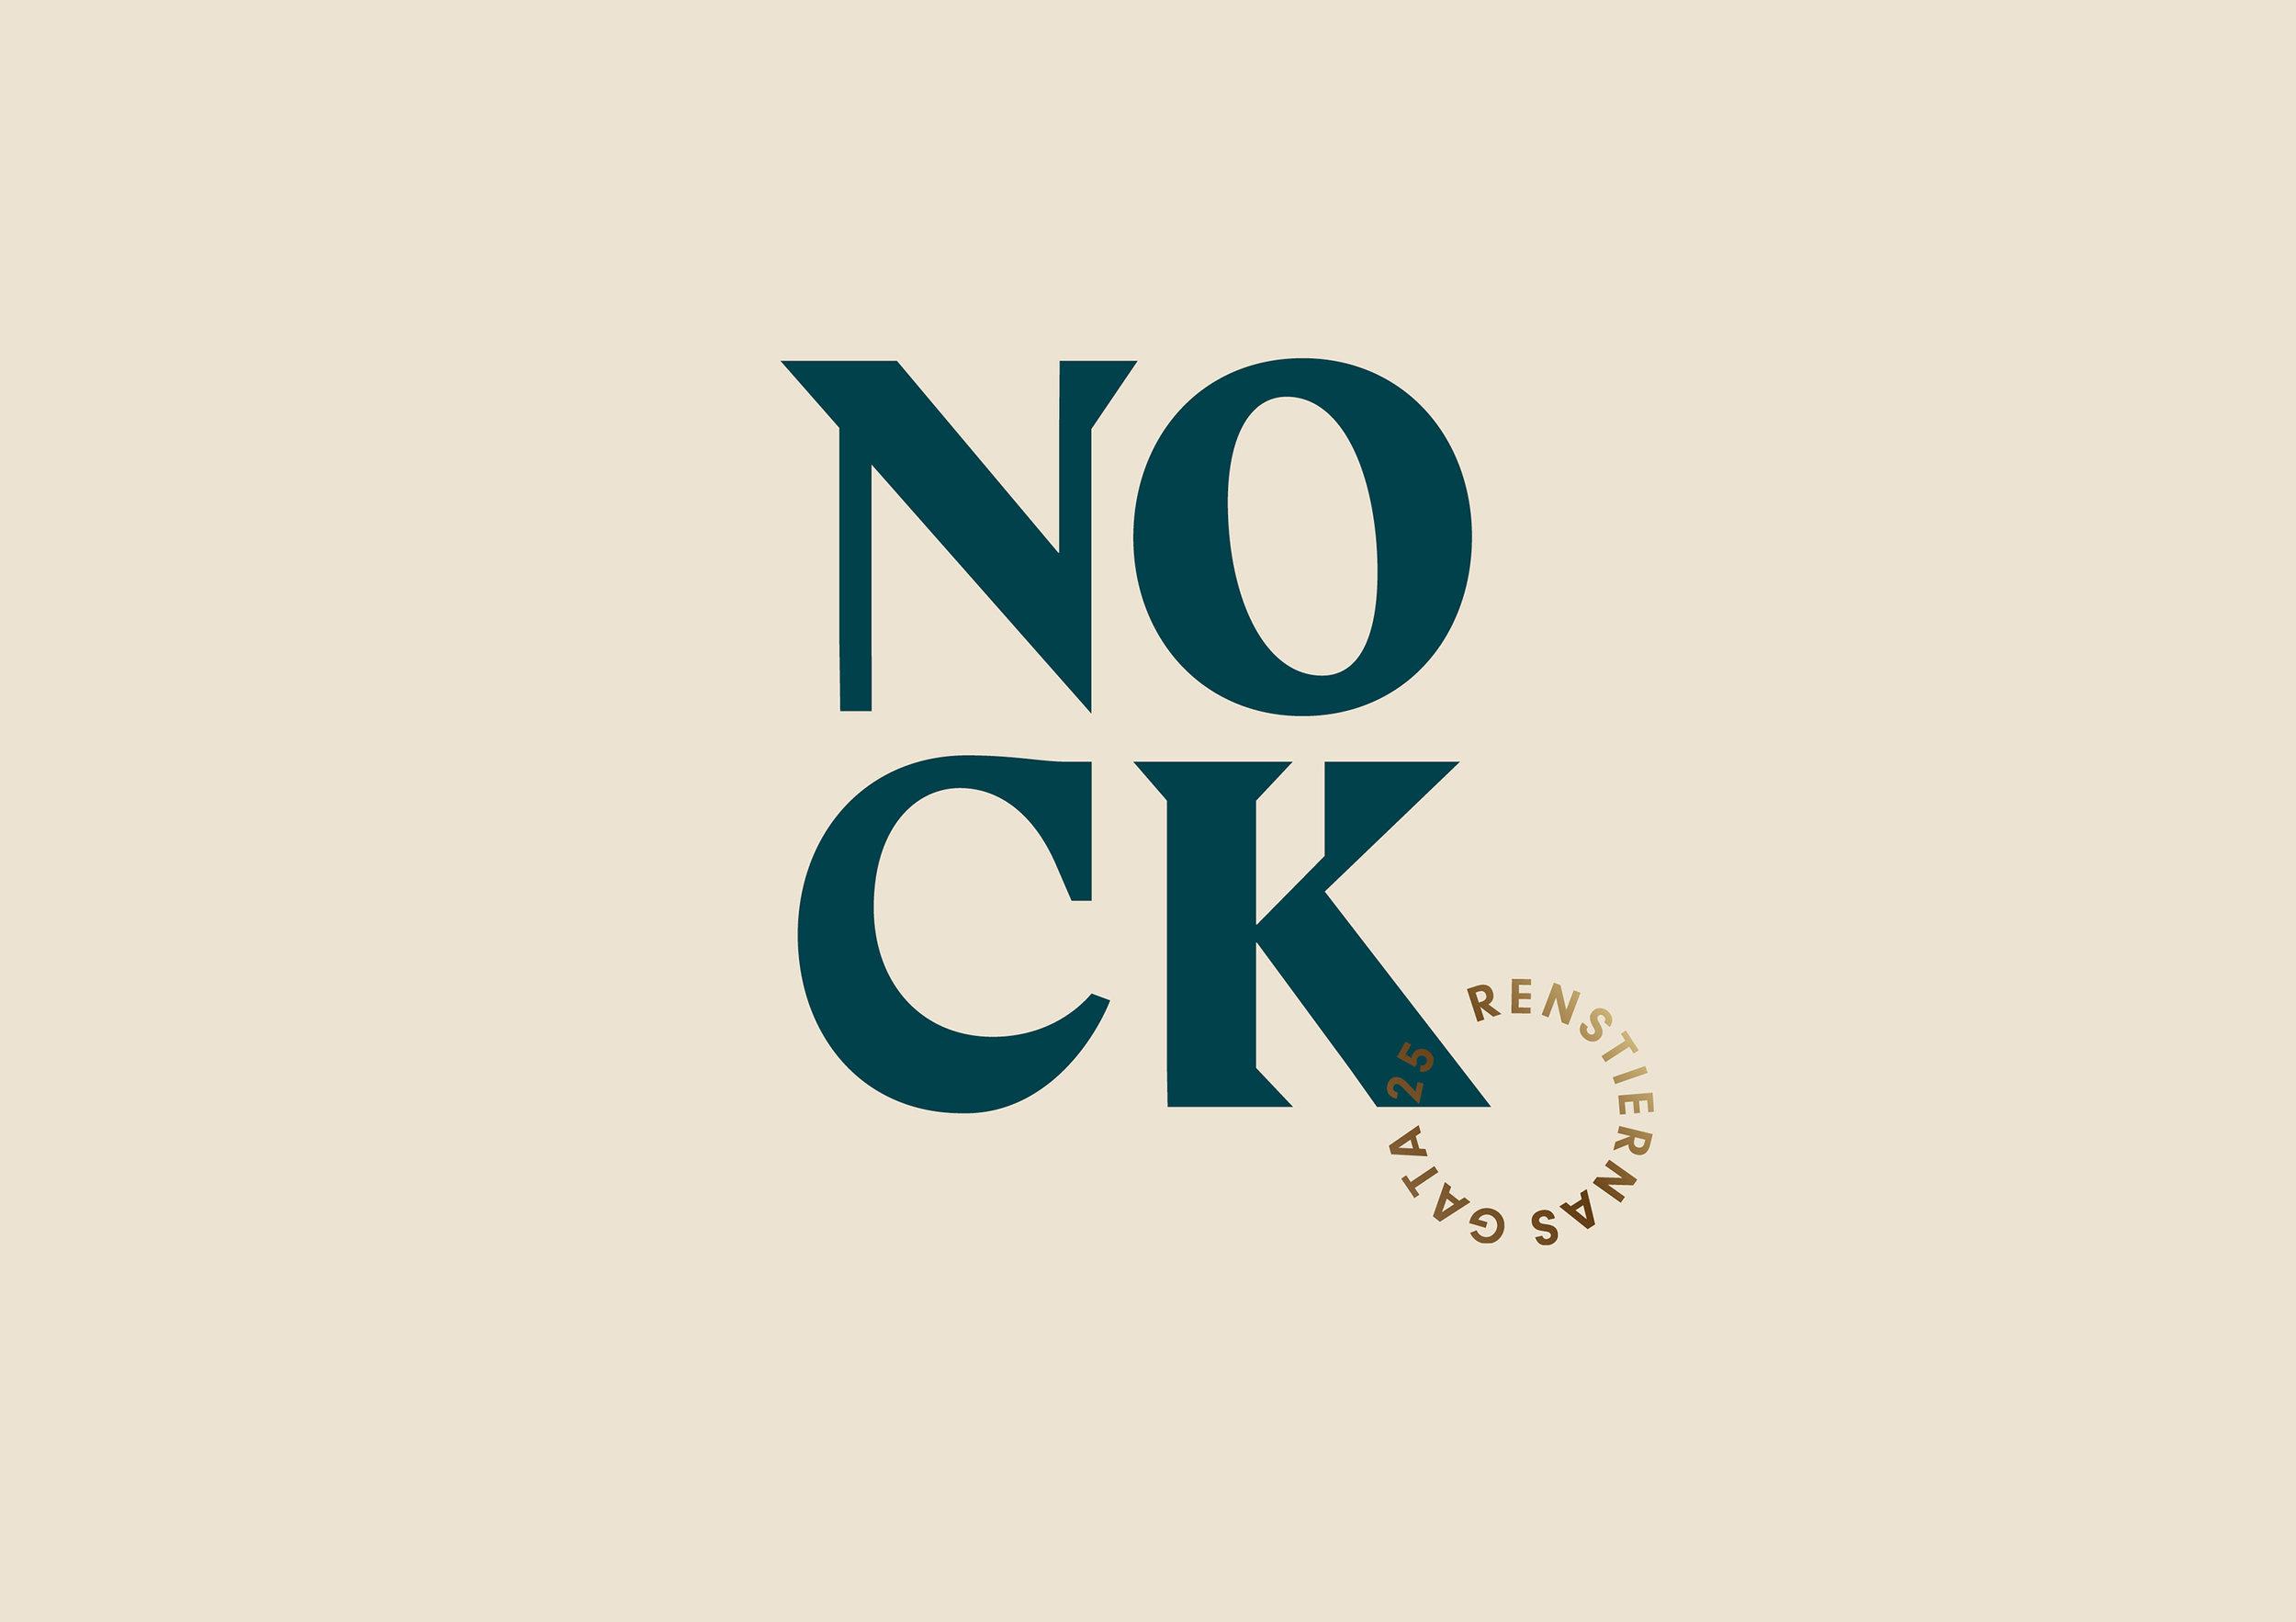 nock.jpg